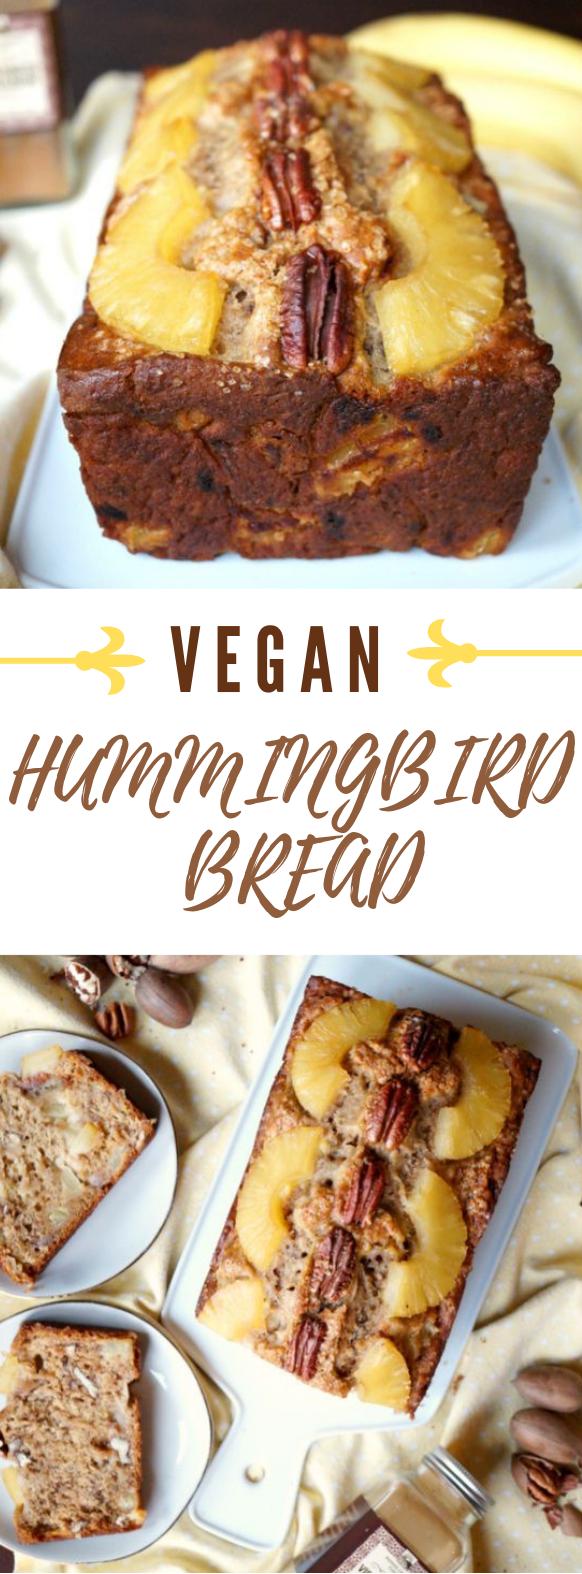 VEGAN HUMMINGBIRD BREAD #vegan #cake